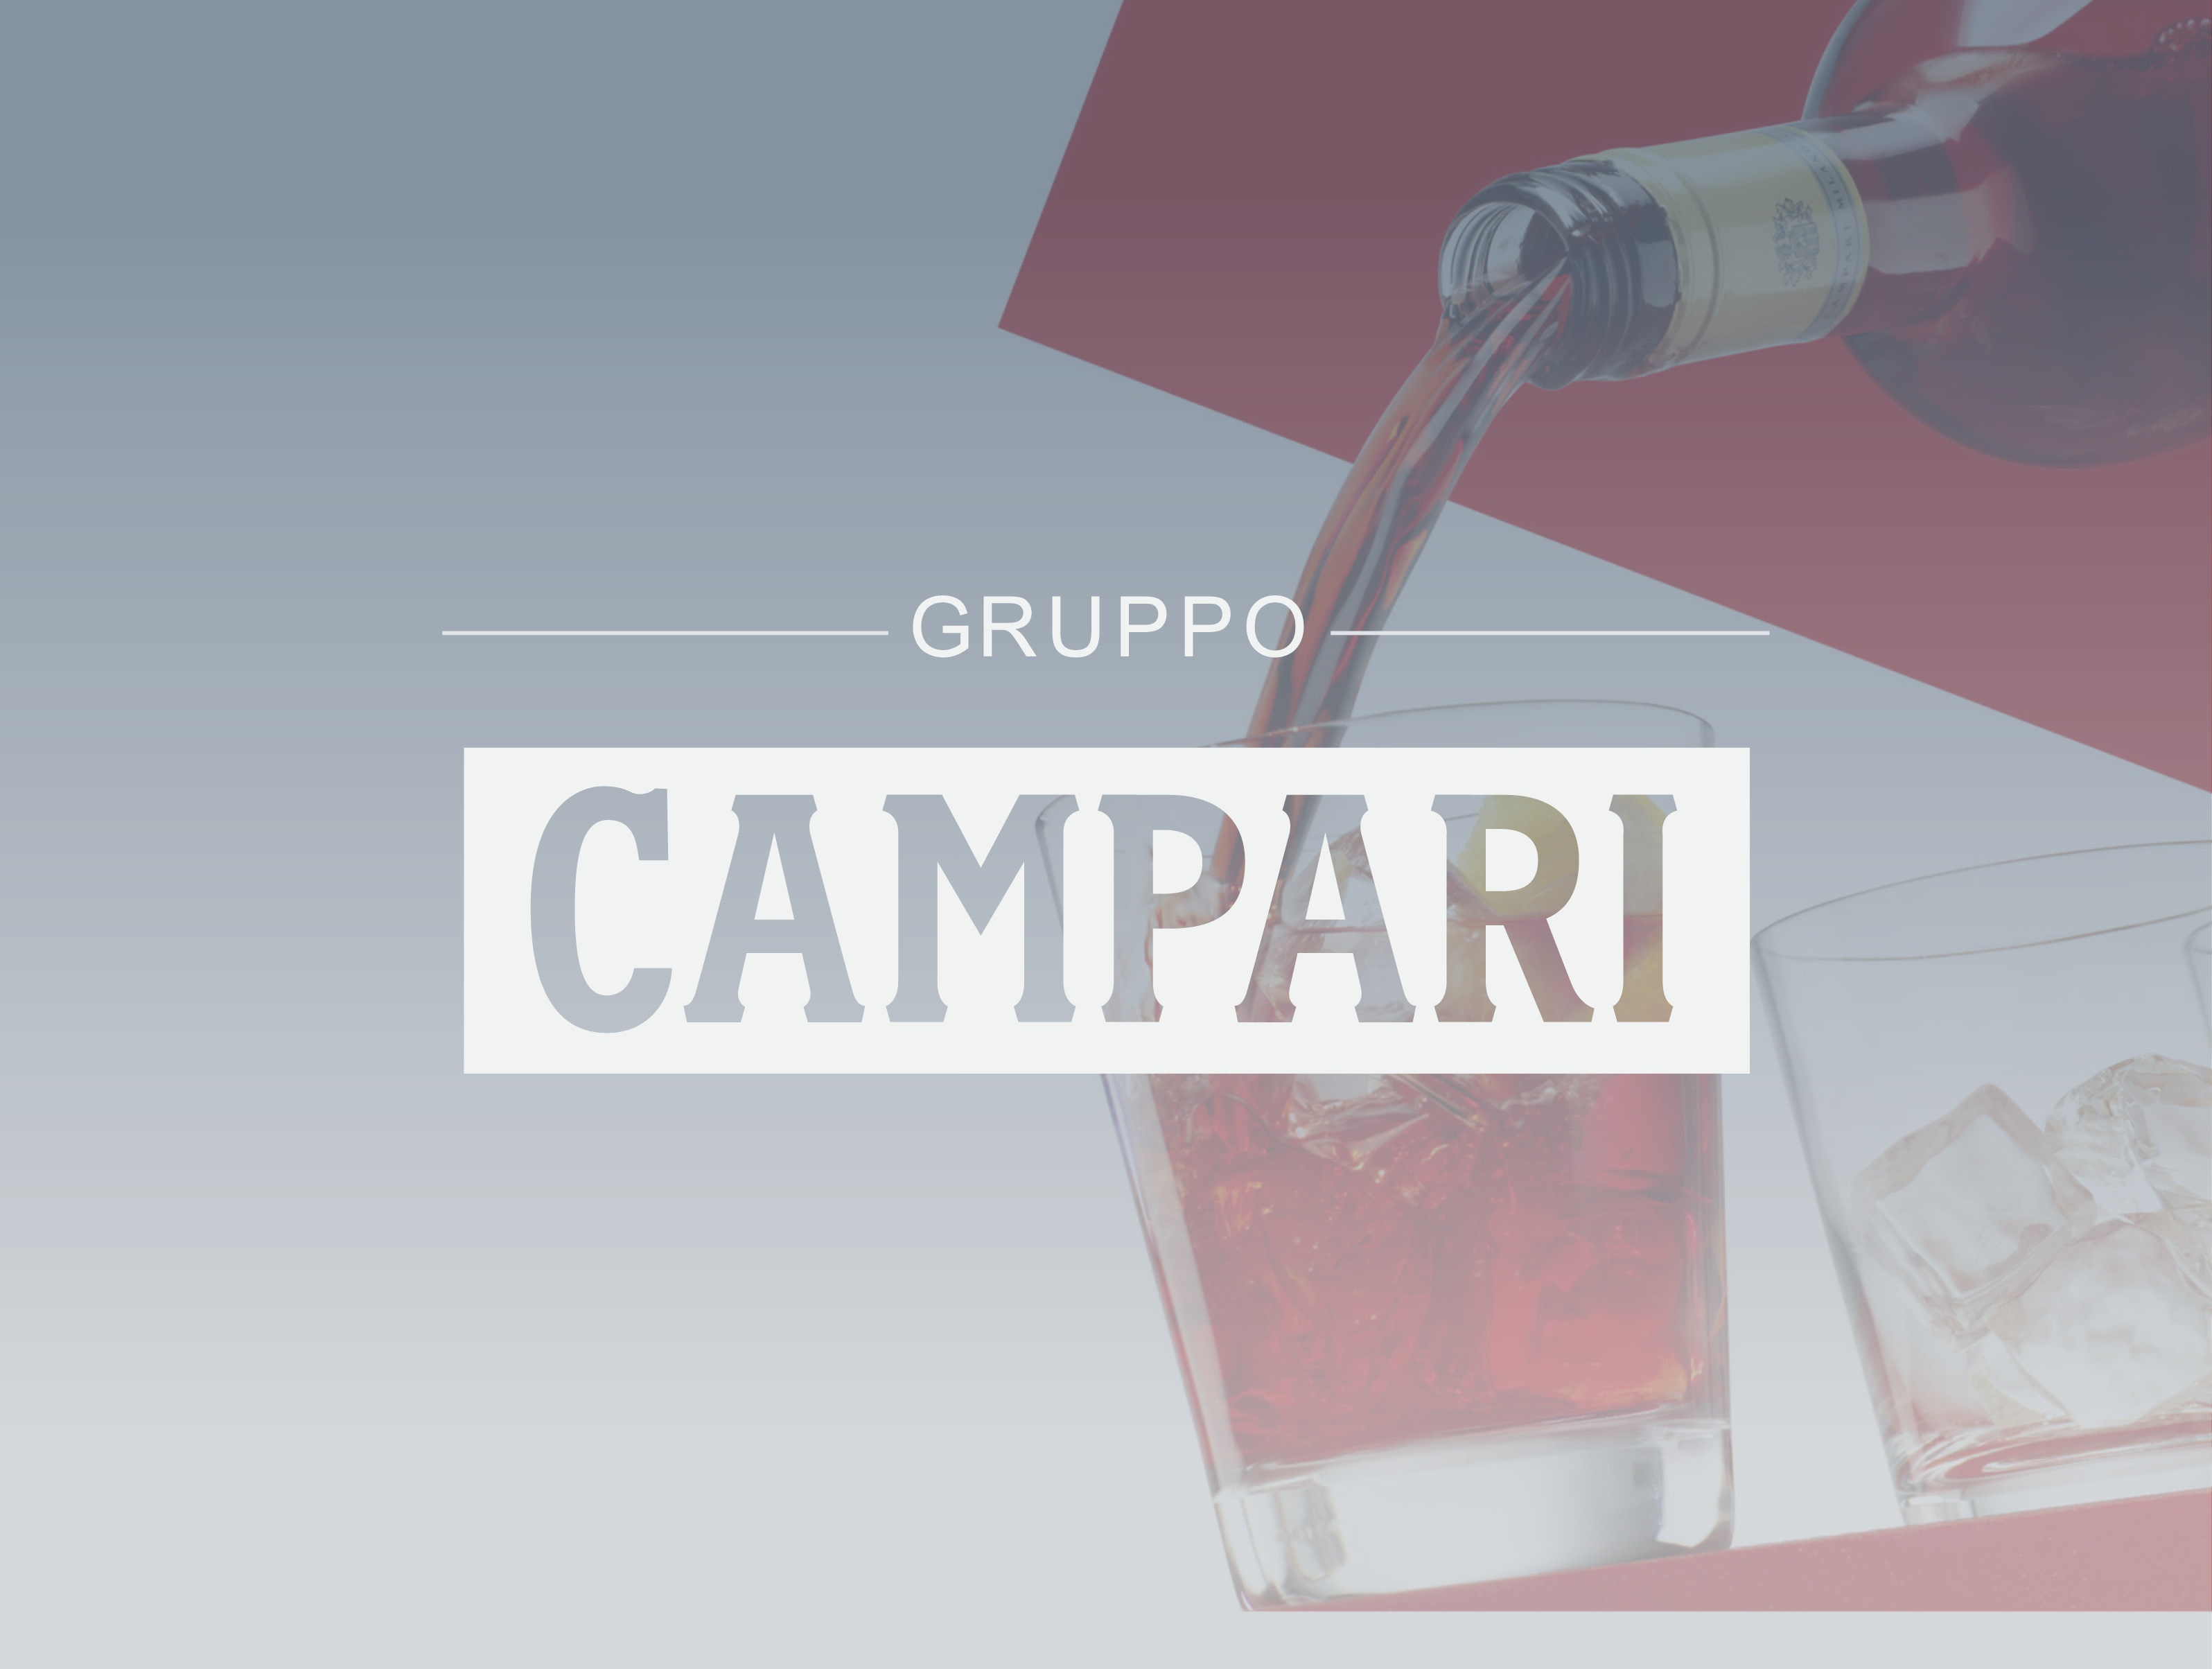 Campari-Customer Pages